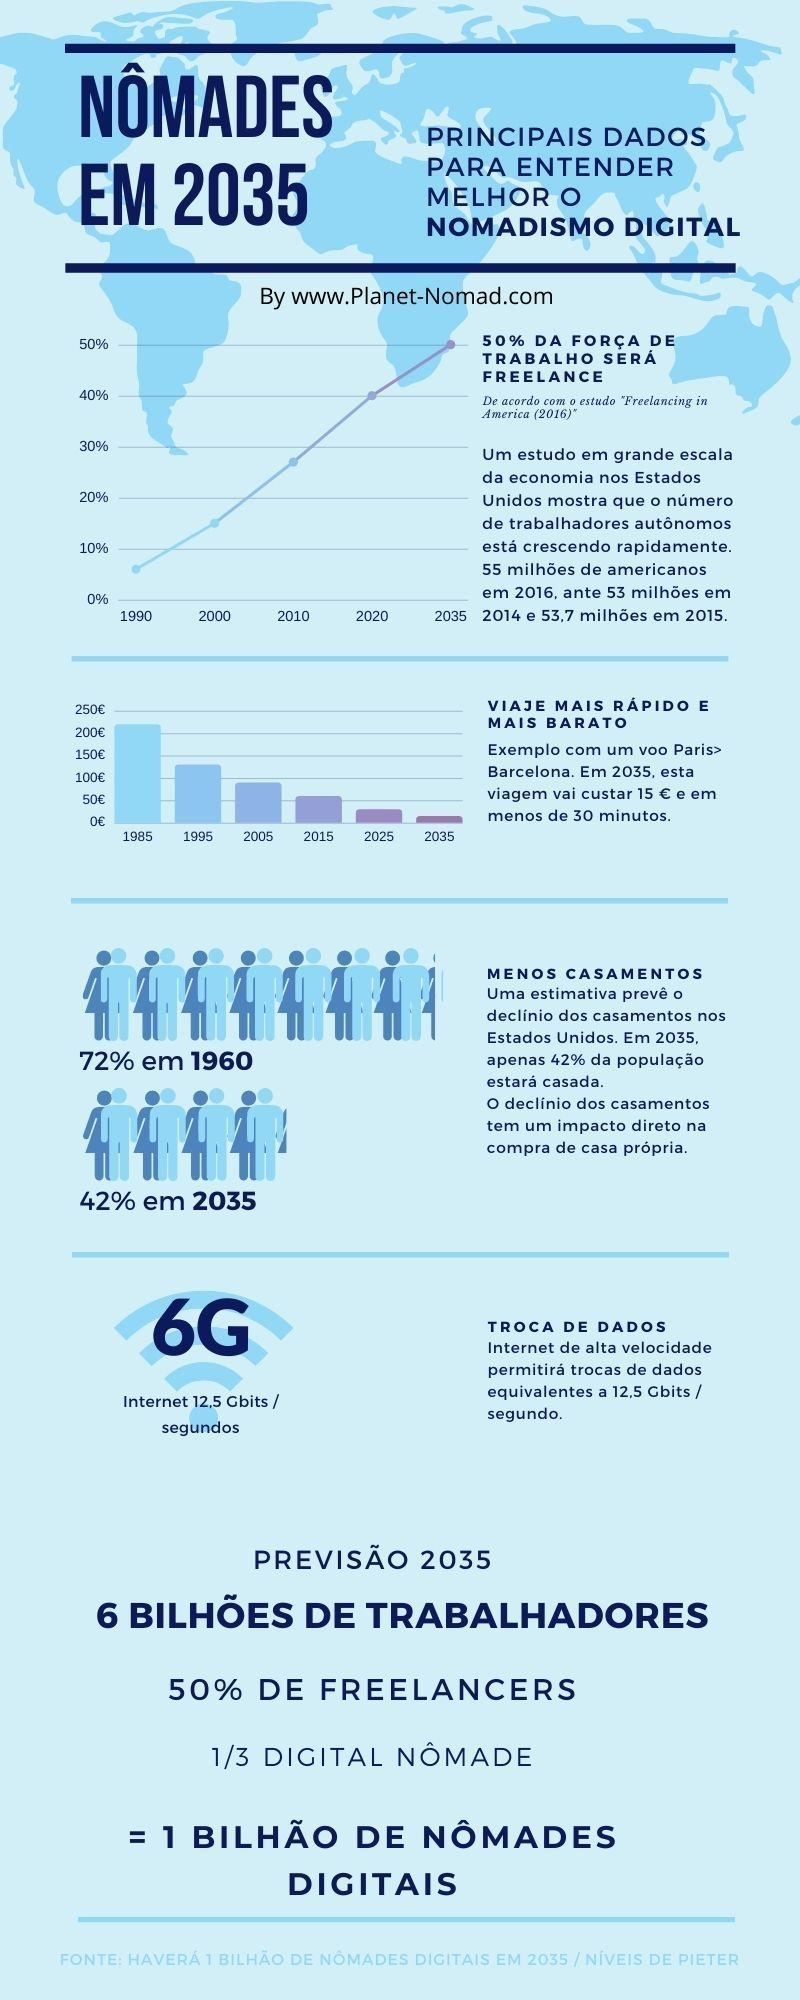 Nomade digital em 2035